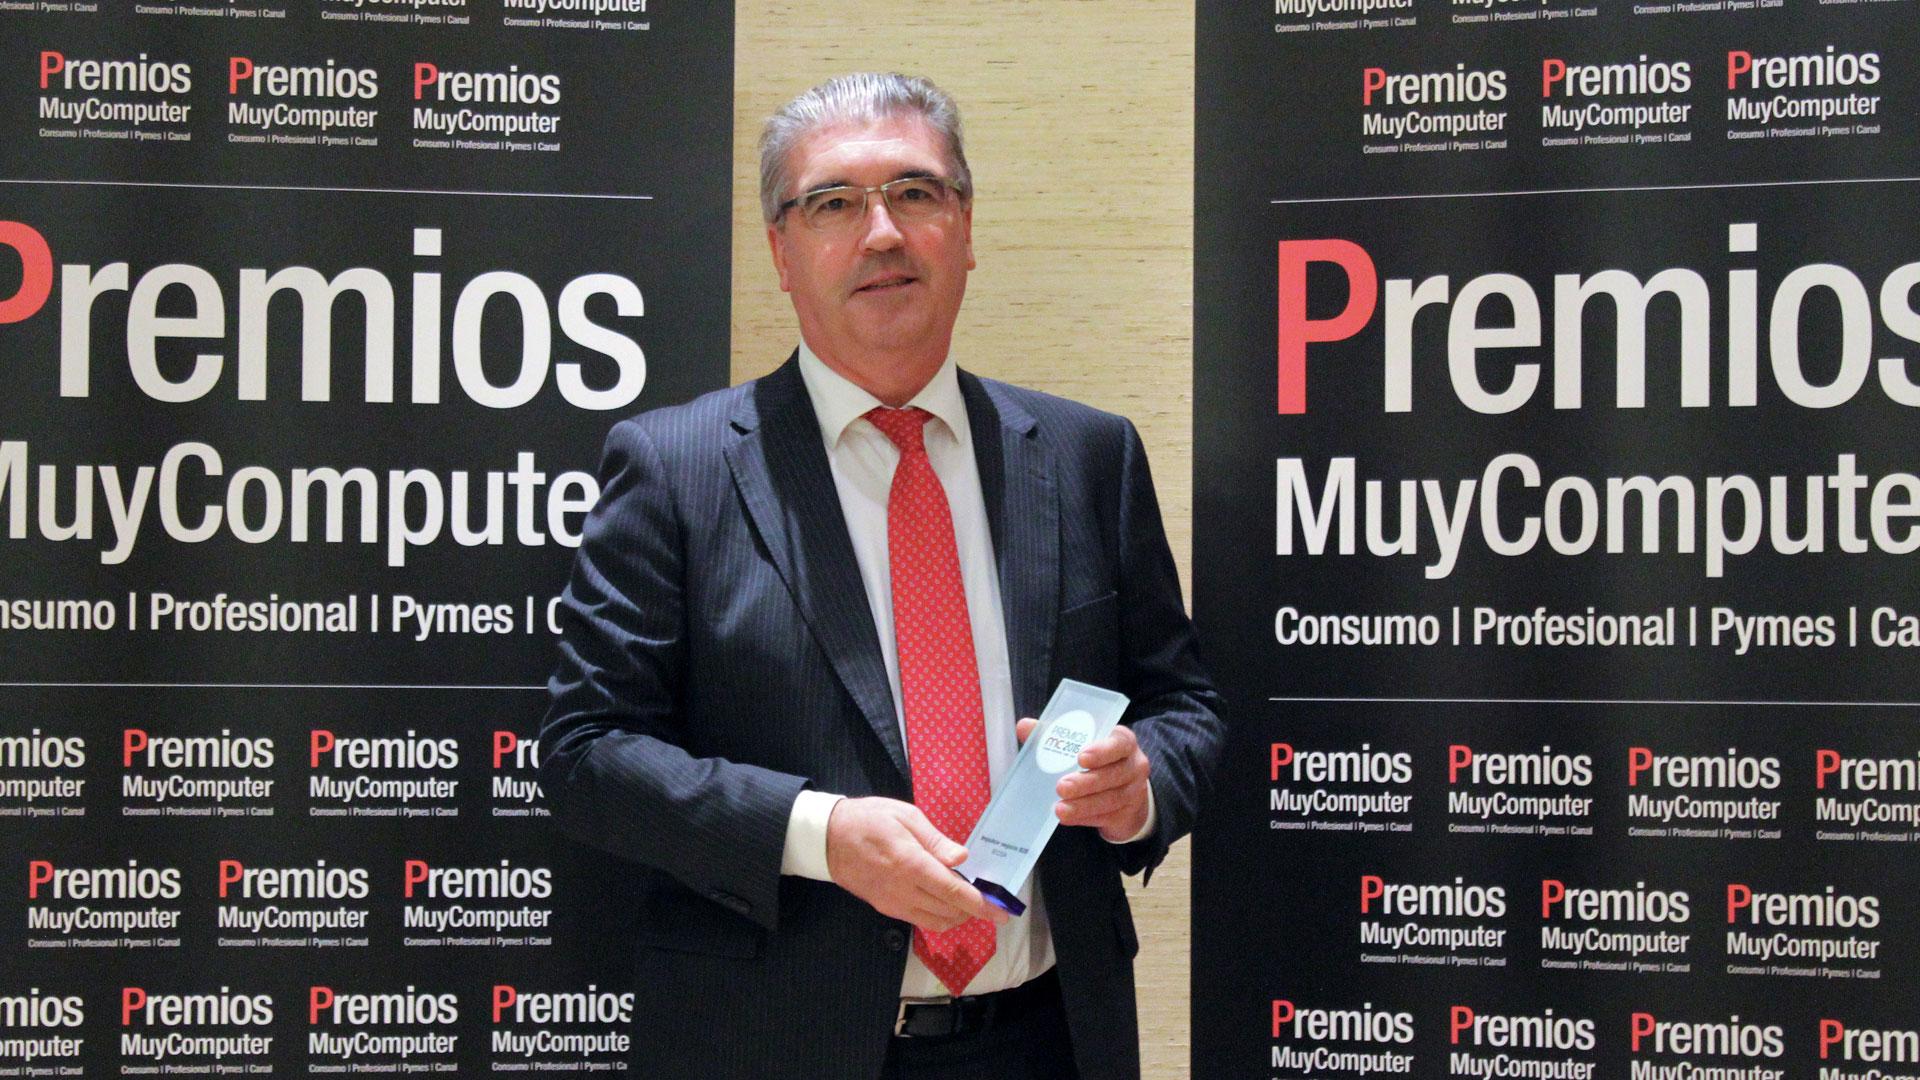 premios-mc2015-iecisa-impulsor-negocio-b2b